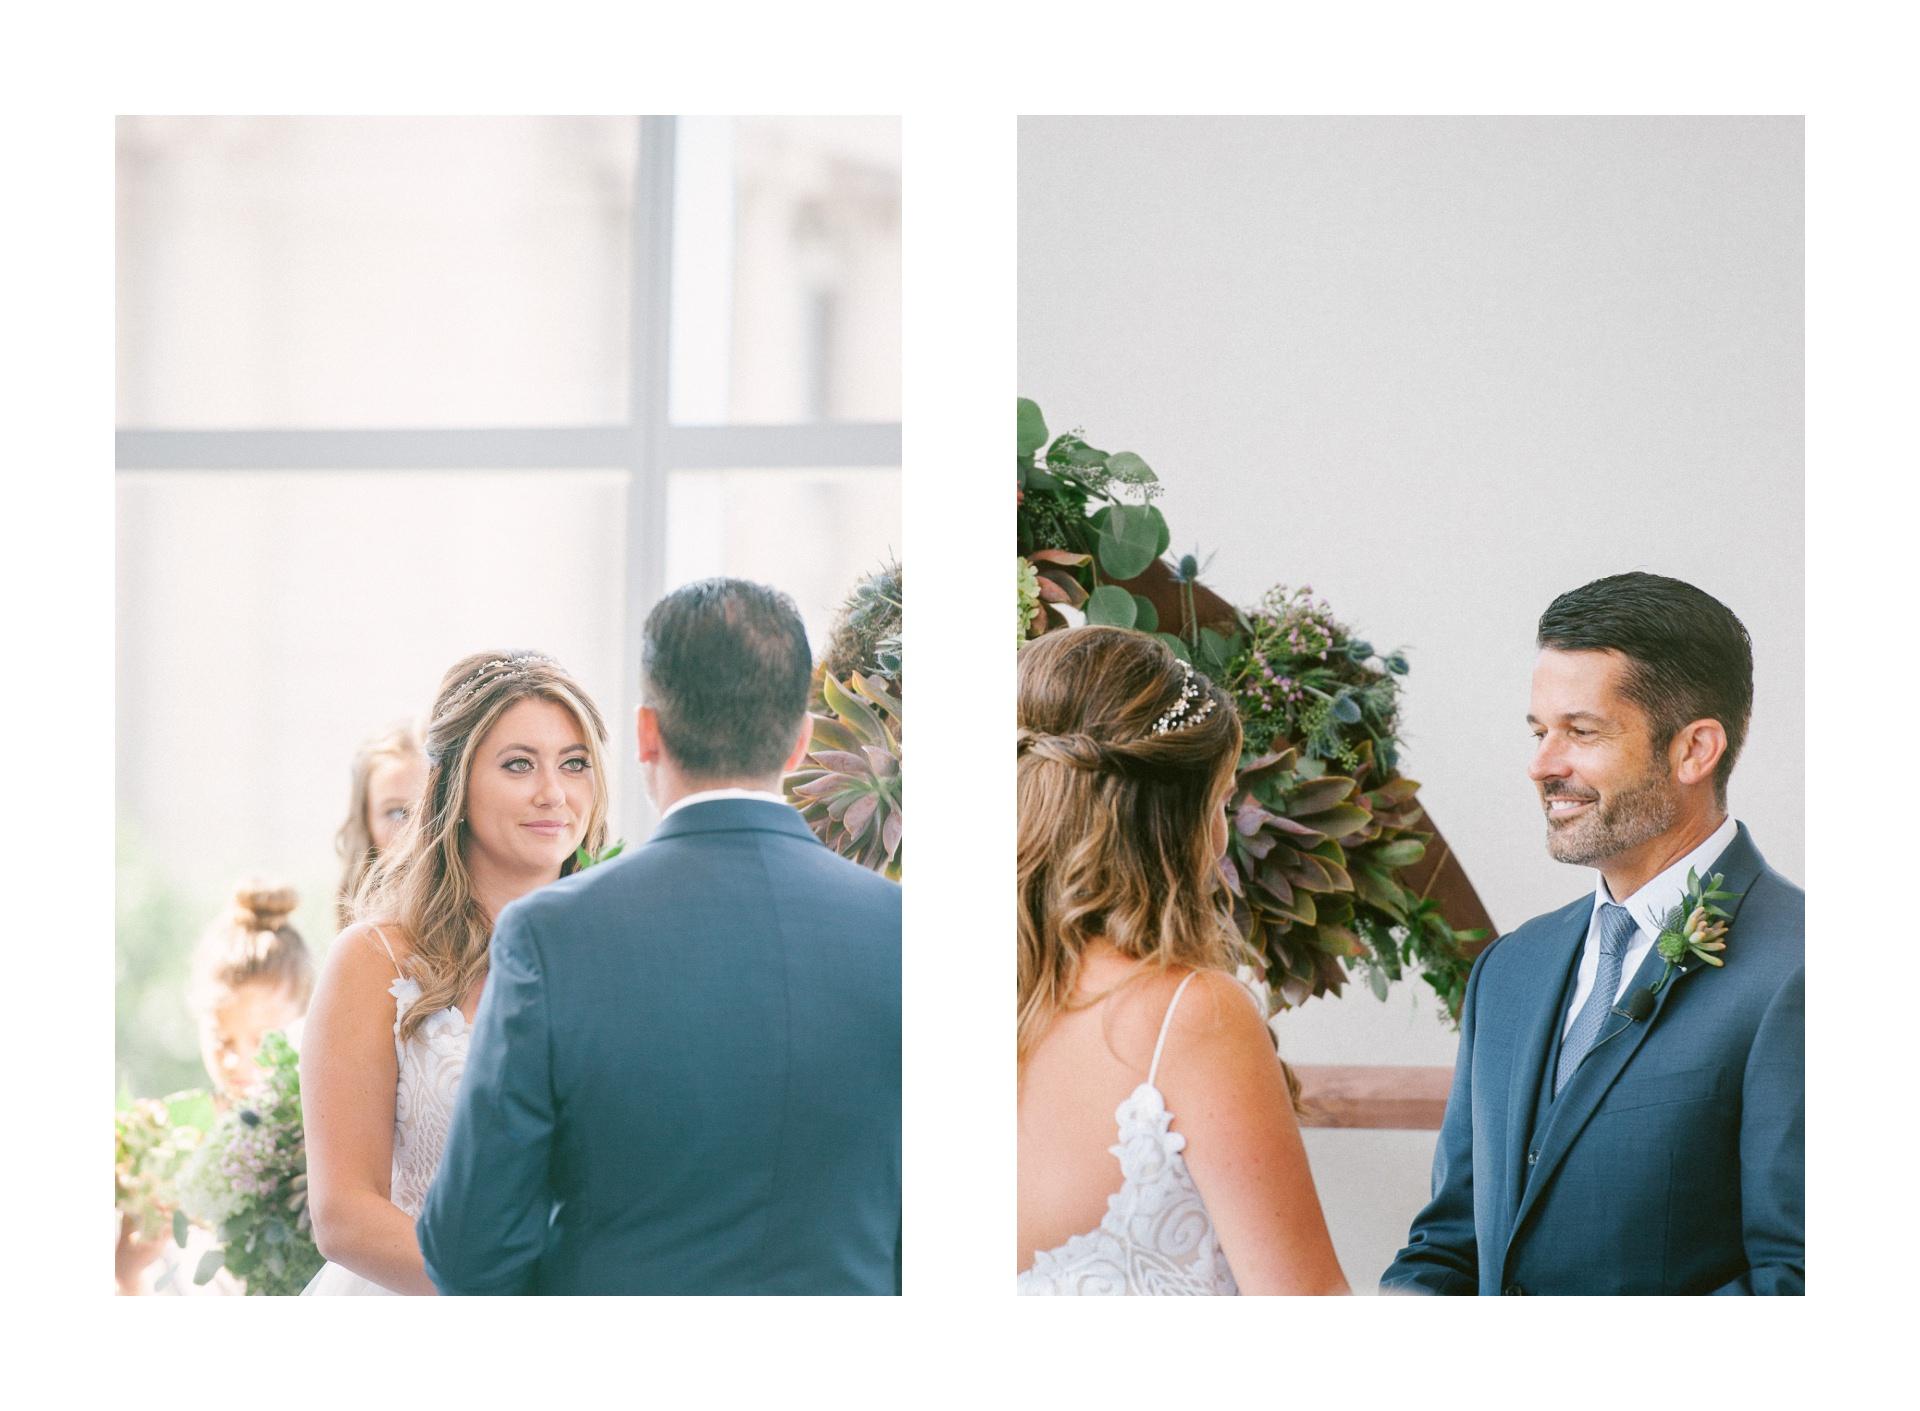 Nuevo Modern Mexican Wedding Photographer in Cleveland 1 23.jpg